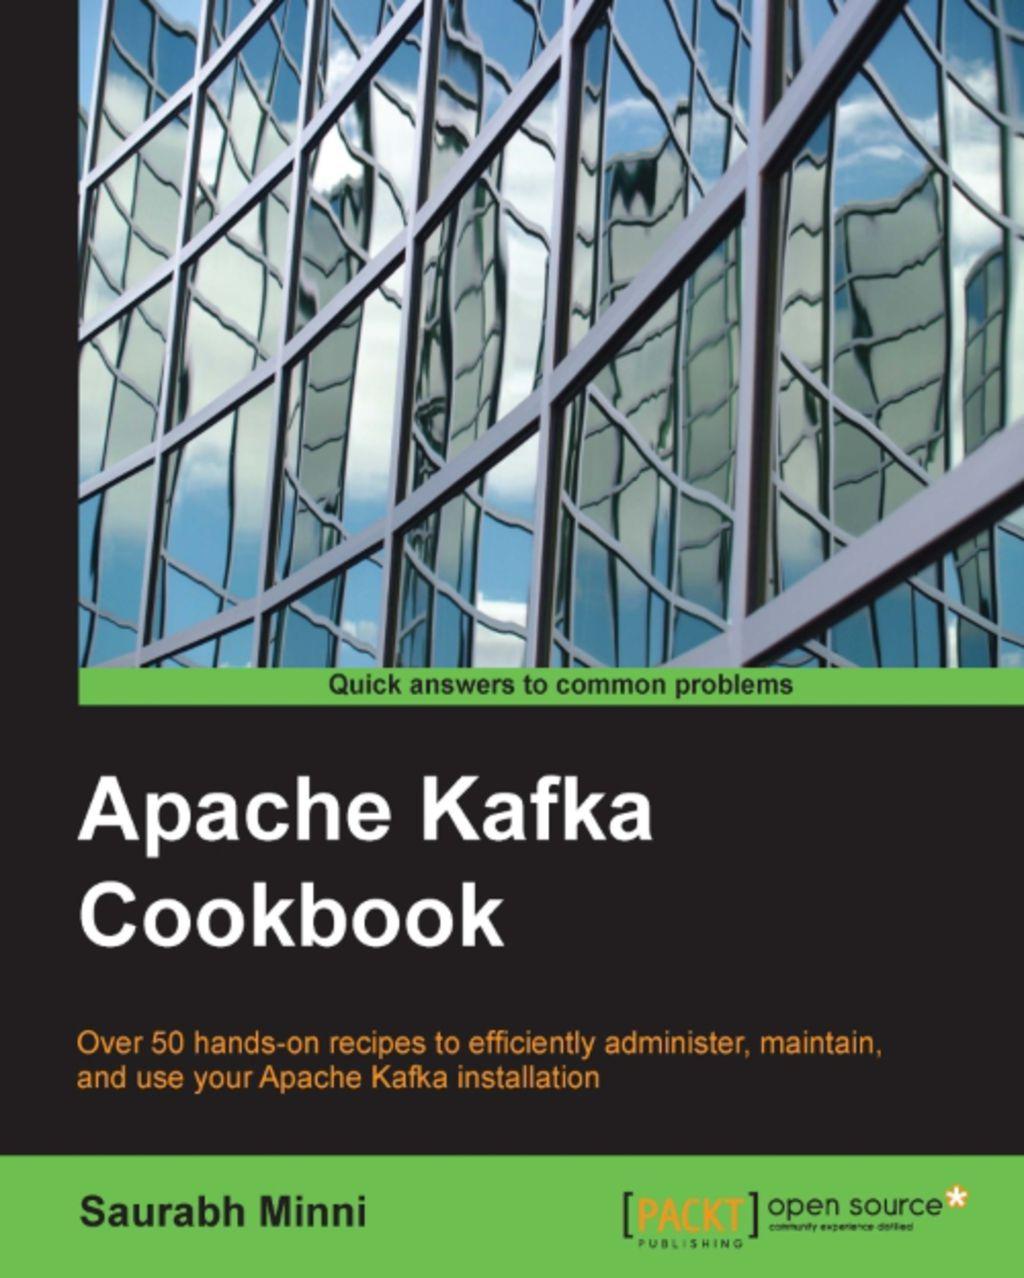 Apache Kafka Cookbook (eBook) in 2019 | Products | Apache